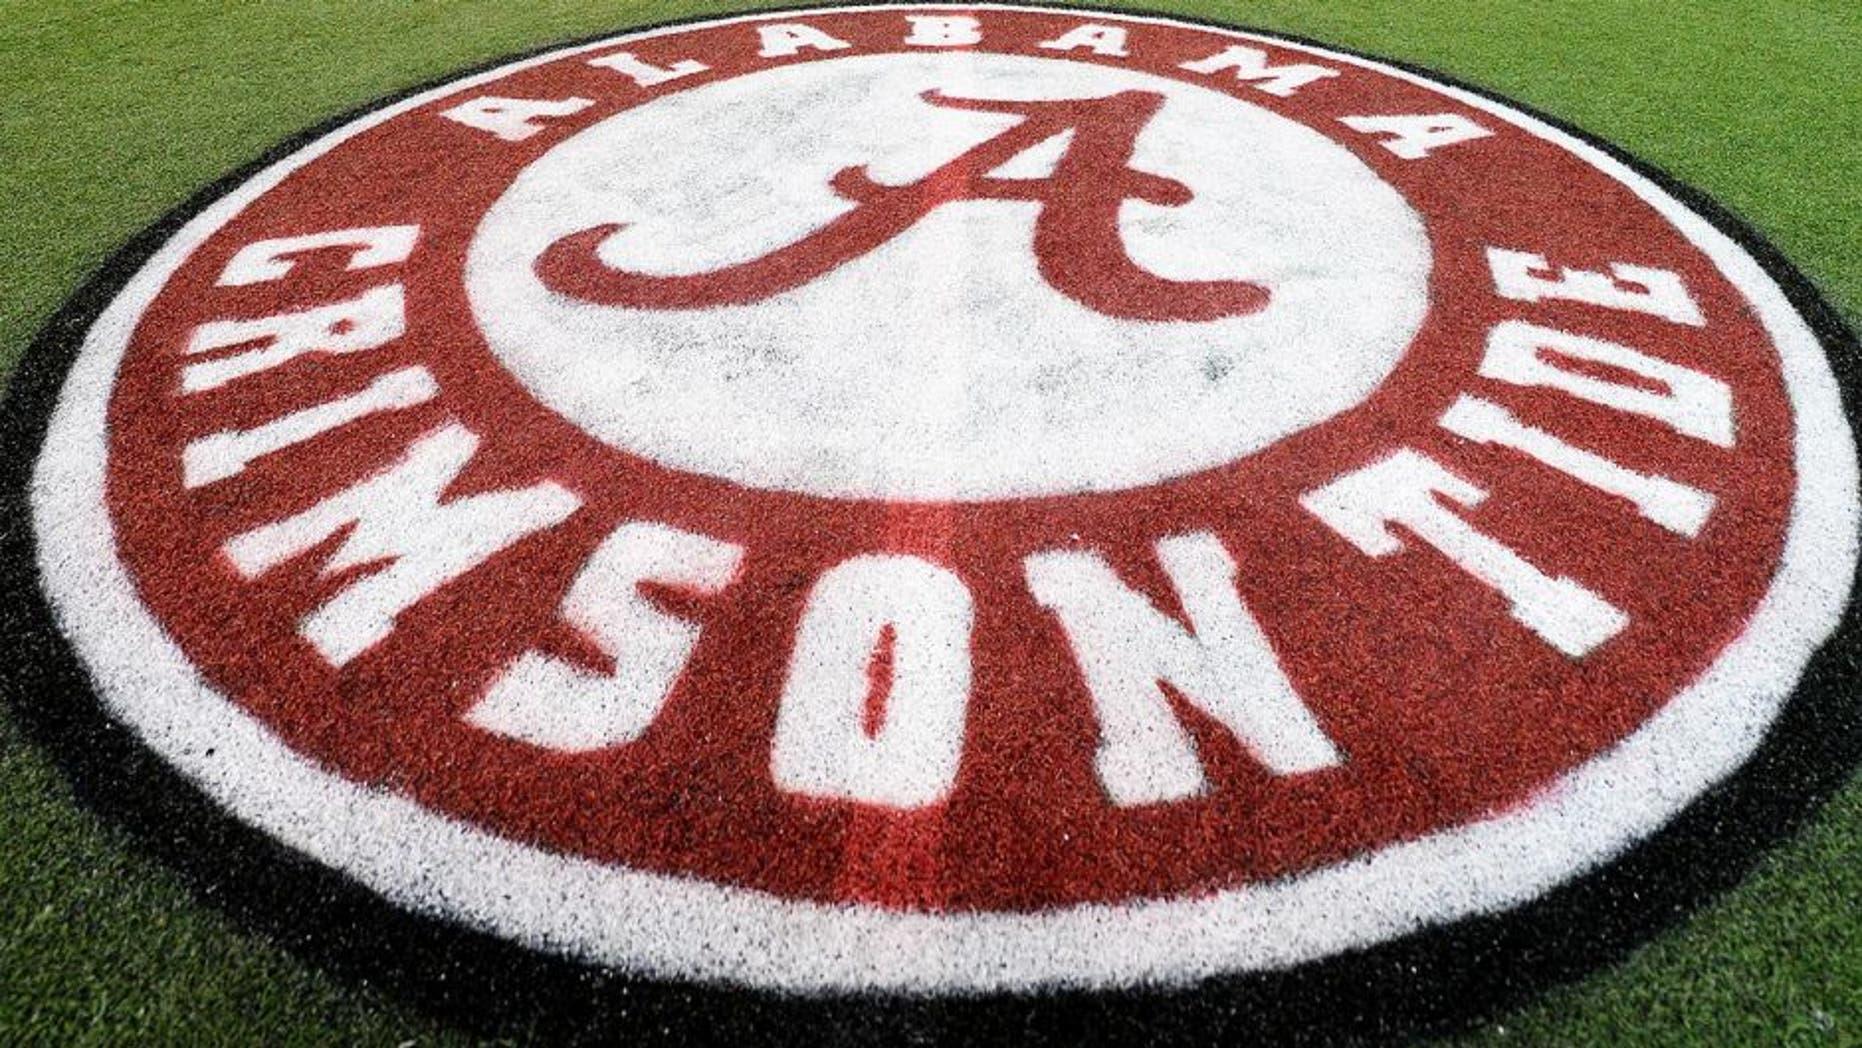 Dec 5, 2014; Atlanta, GA, USA; The Alabama Crimson Tide logo is seen on the field of the Georgia Dome. Alabama plays Missouri in the SEC Championship on Saturday. Mandatory Credit: John David Mercer-USA TODAY Sports